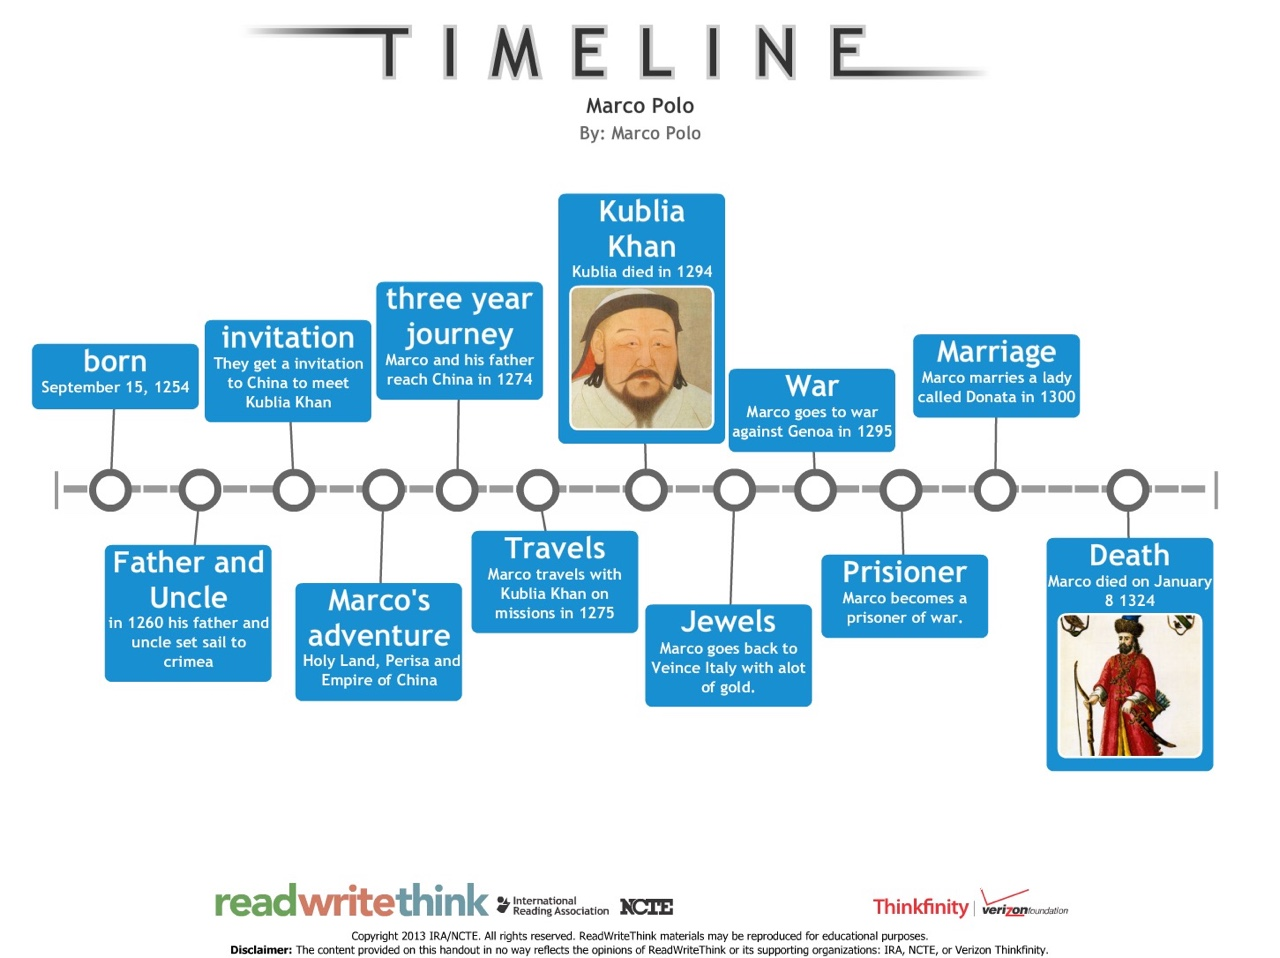 marco polo timeline